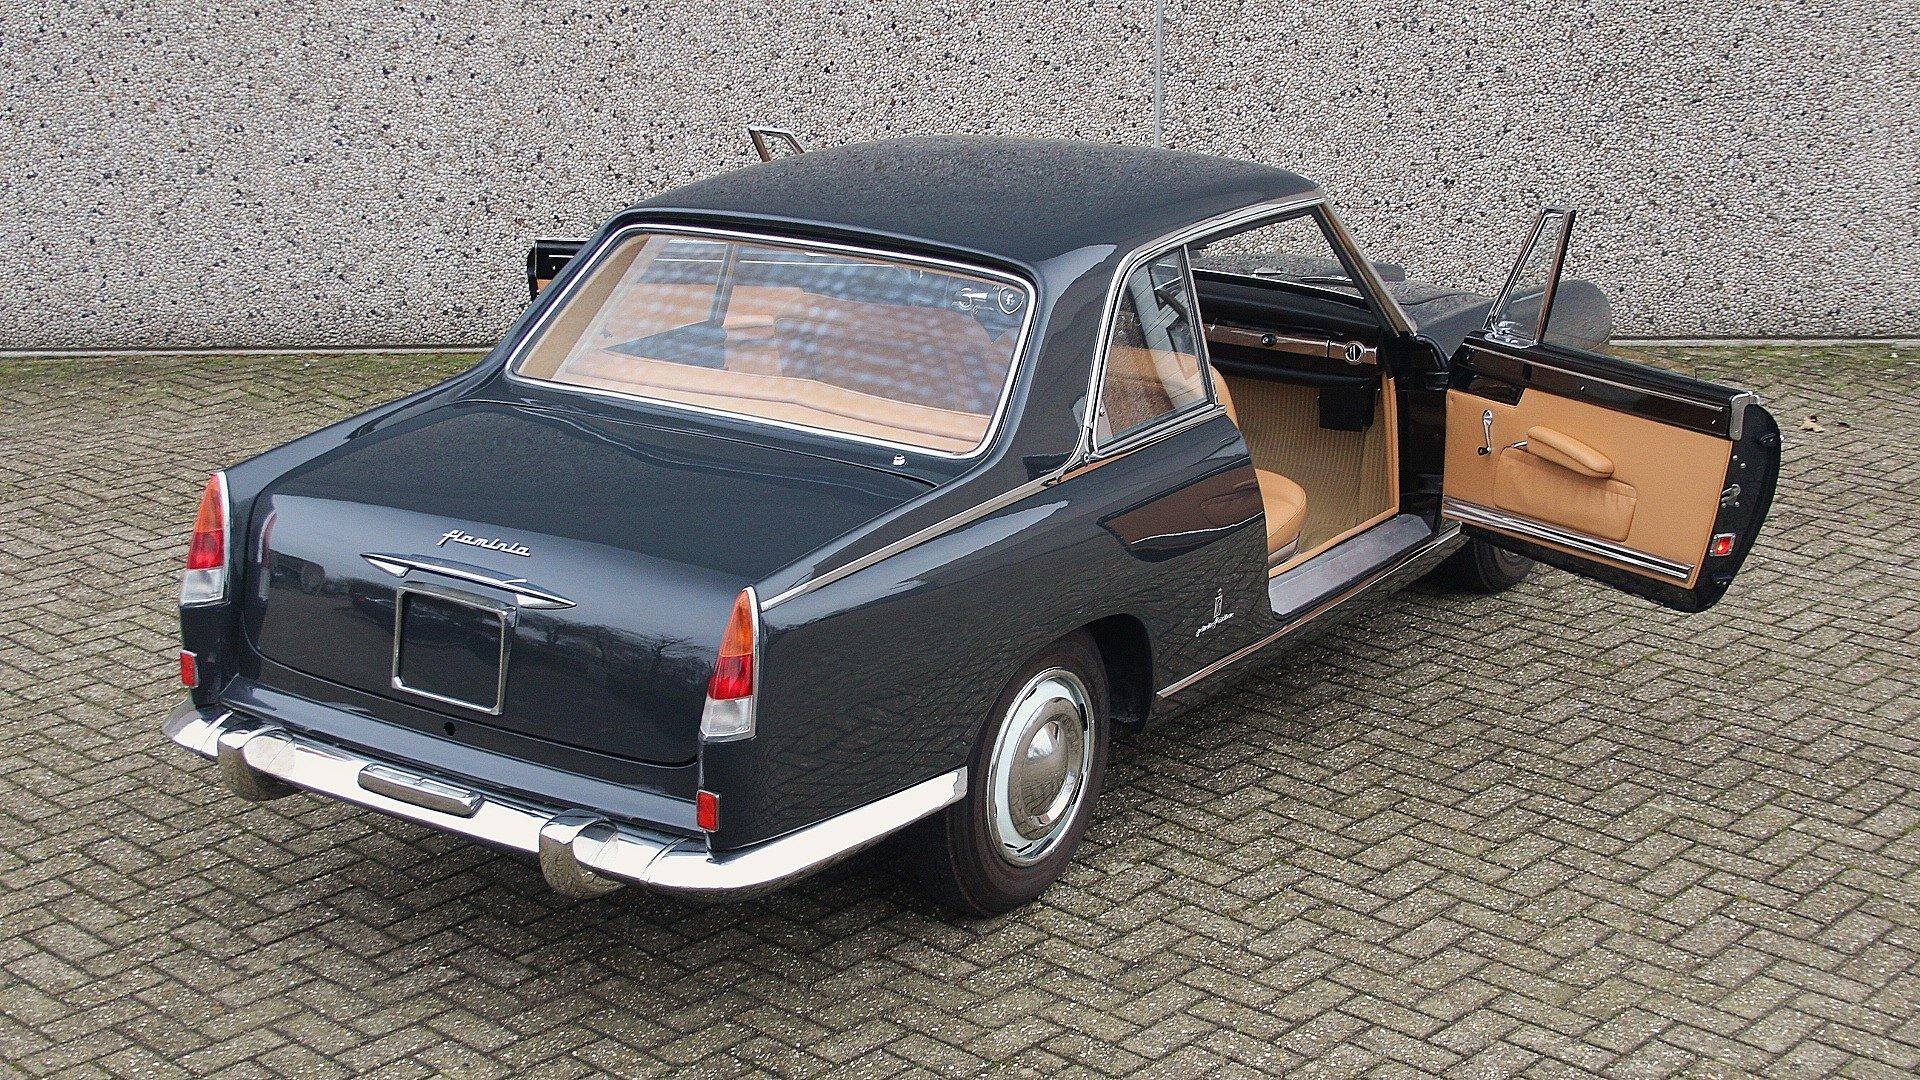 1963 Lancia Flaminia Pininfarina Coupe 2.5 For Sale (picture 4 of 6)